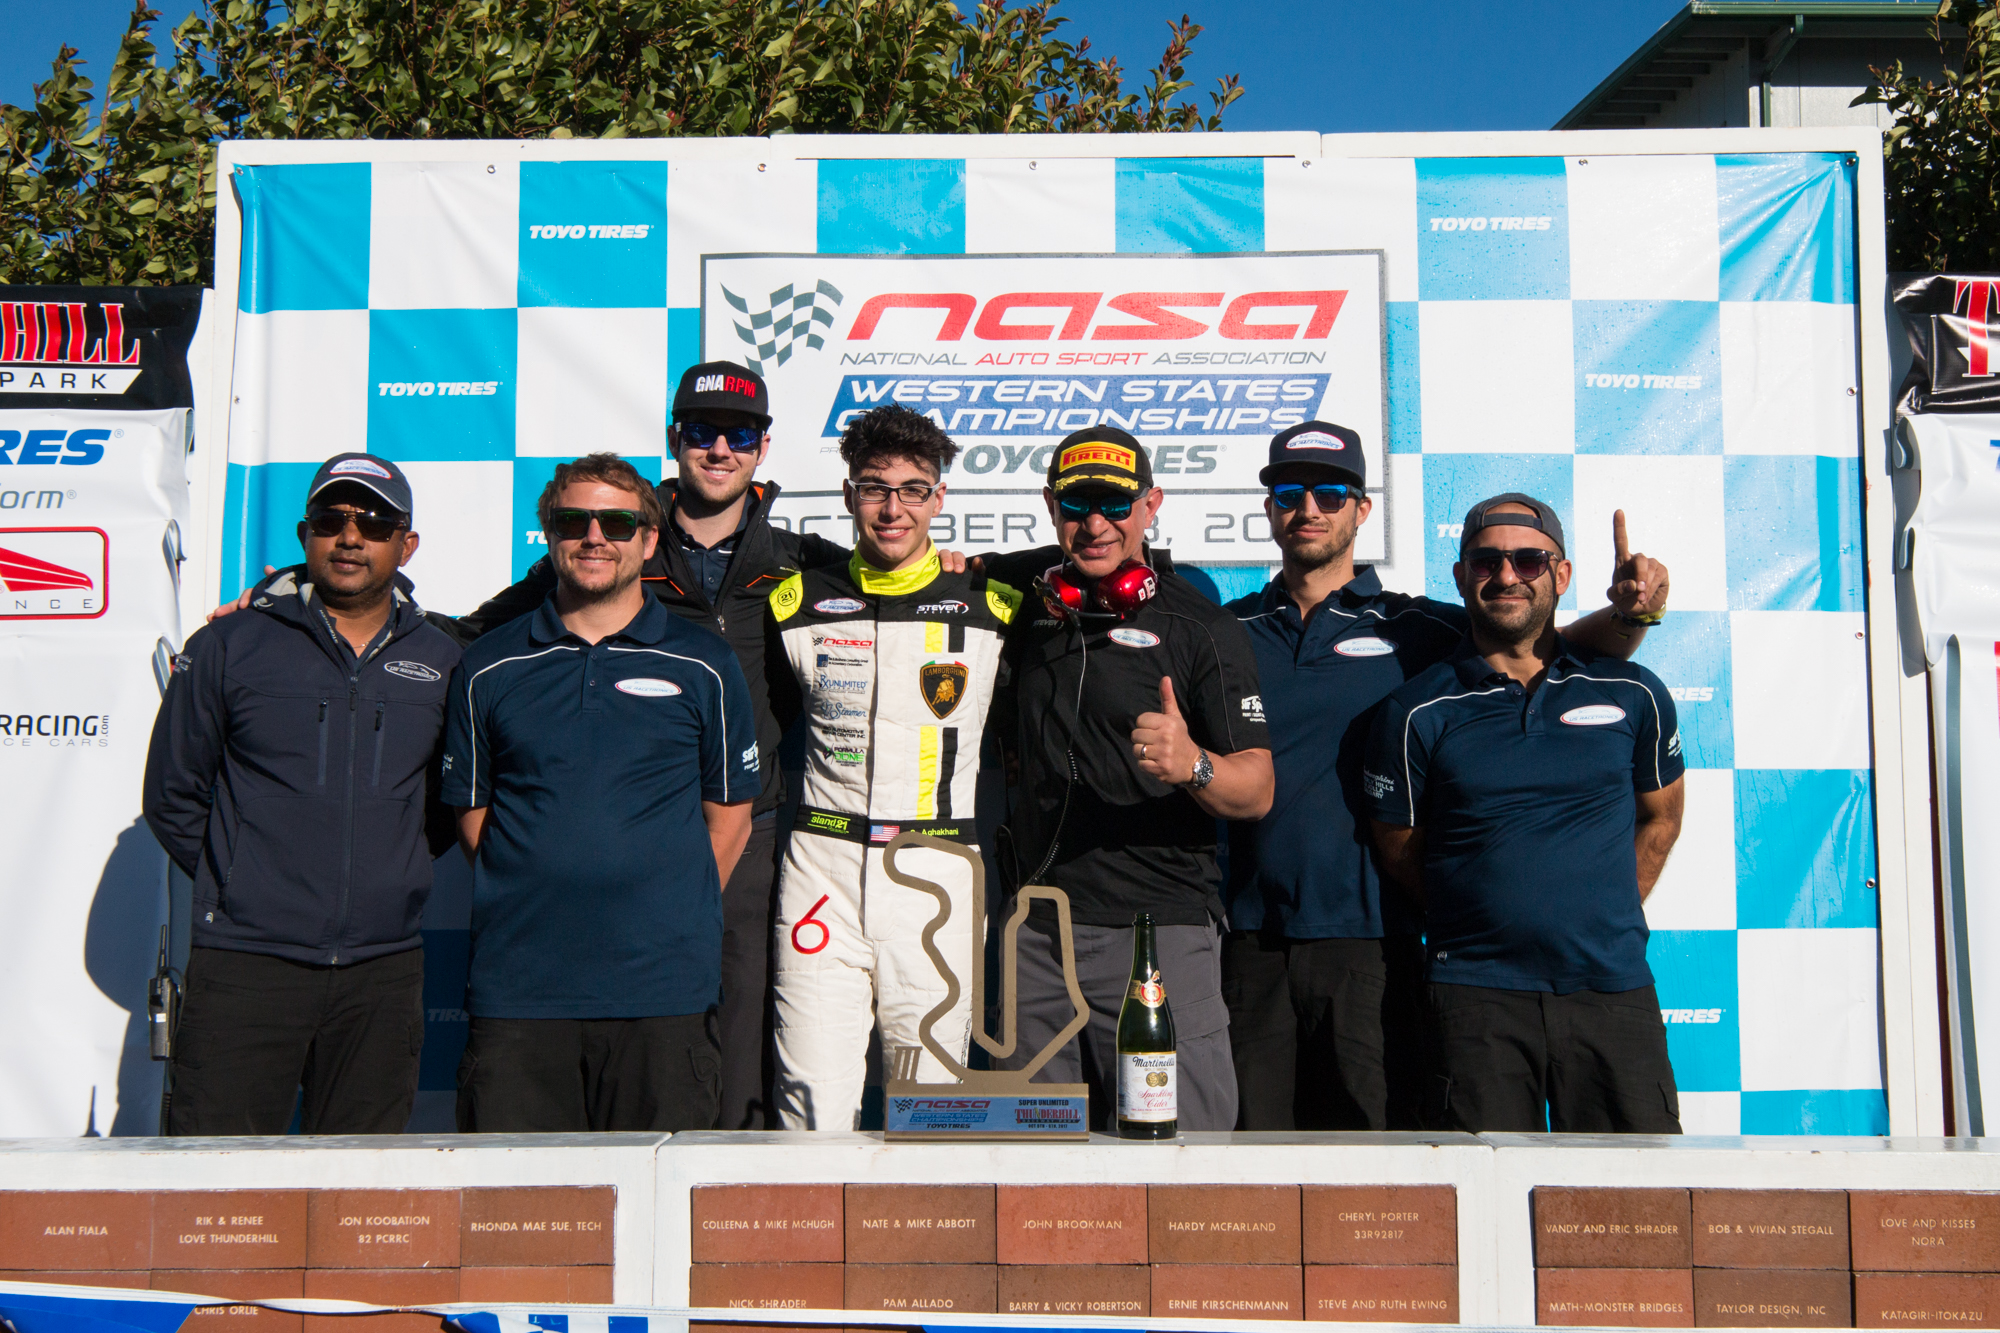 Steven-Racing-20130208-45969.jpg